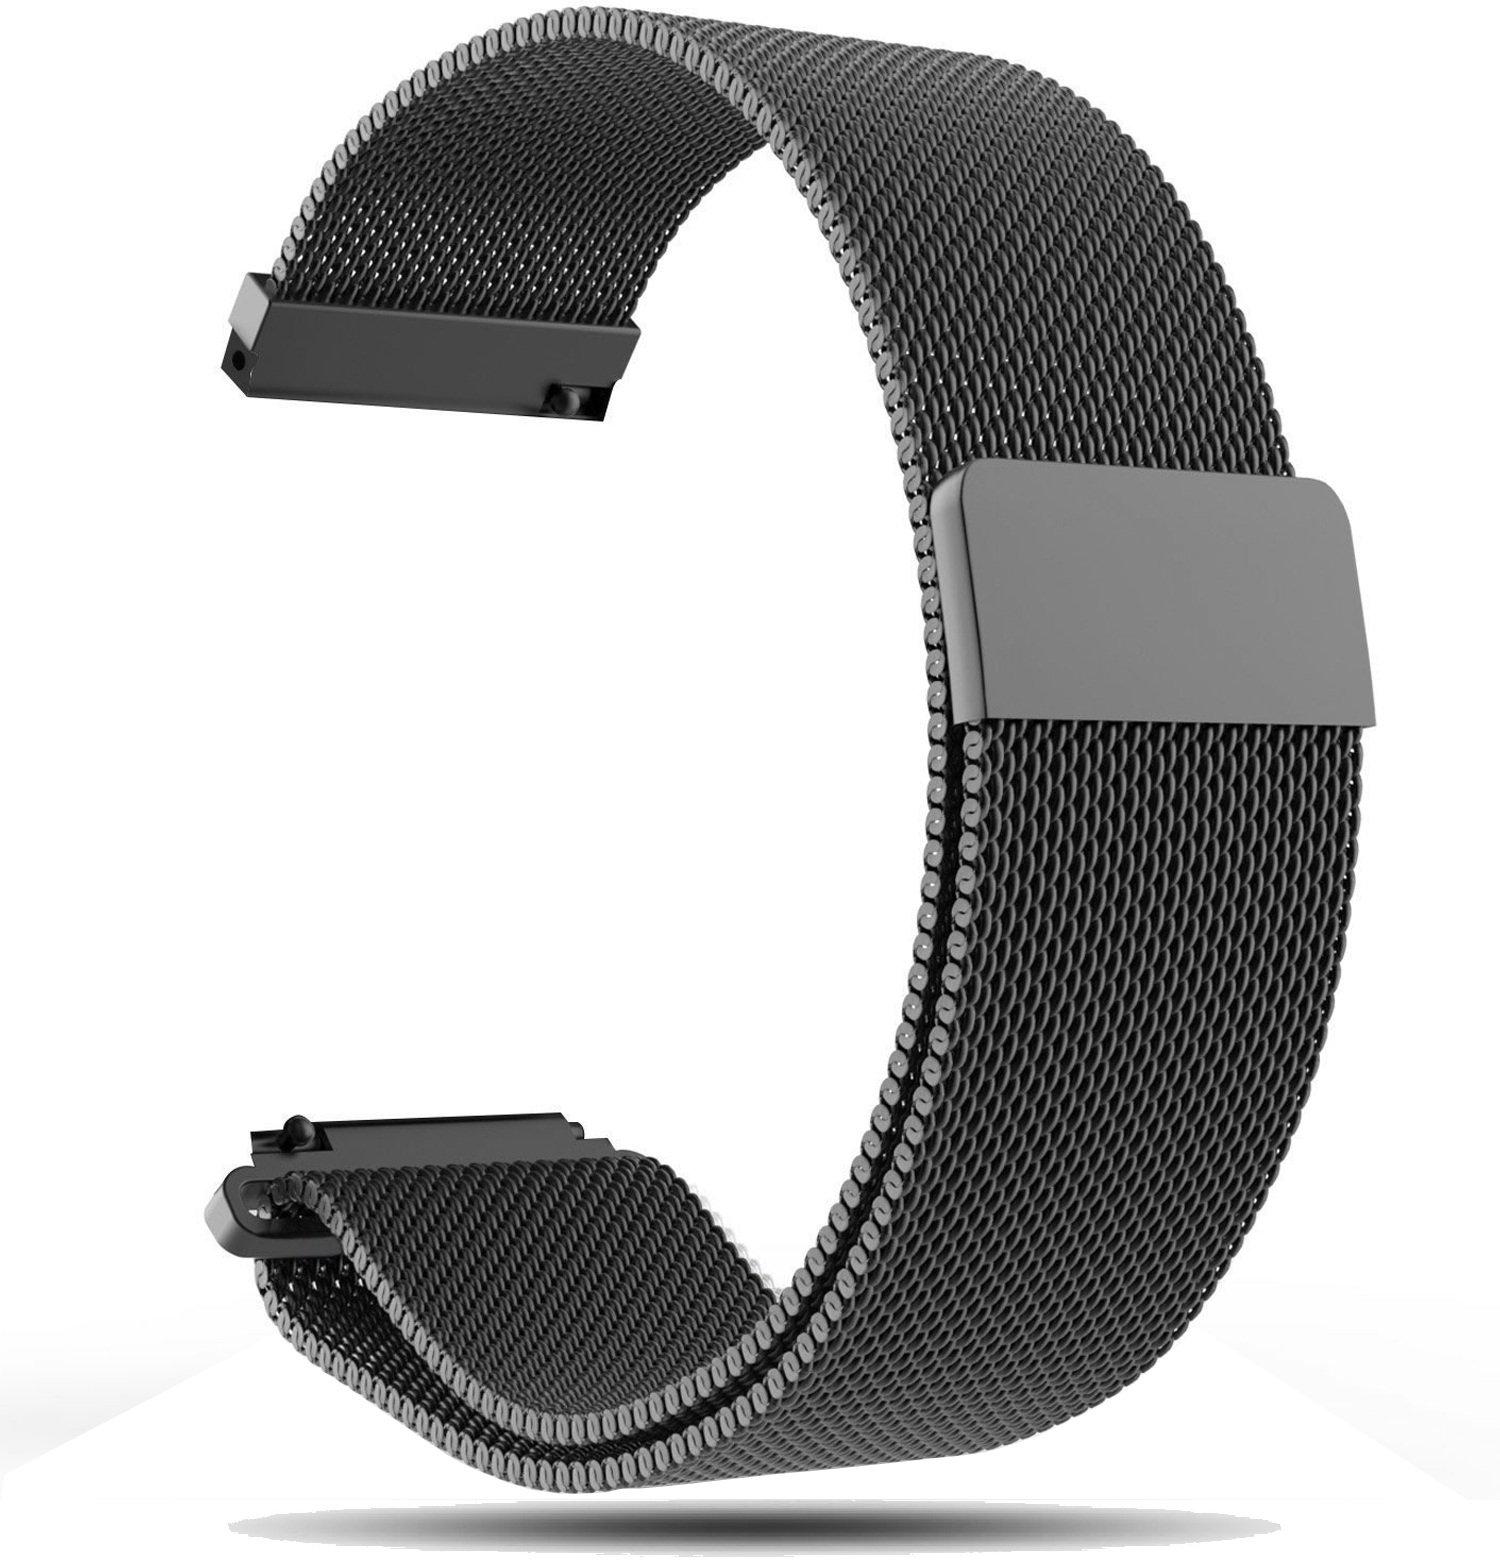 Universalband-fr-Fossil-Q-Farbauswahl-Breite-22-mm-Milanaiseband-fr-Fossil-Q-fr-Herren-Crewmaster-Gen-2-HybridFounder-Gen-2-TouchscreenNate-Gen-2-HybridWander-Gen-2-Touchscreen-Tracker